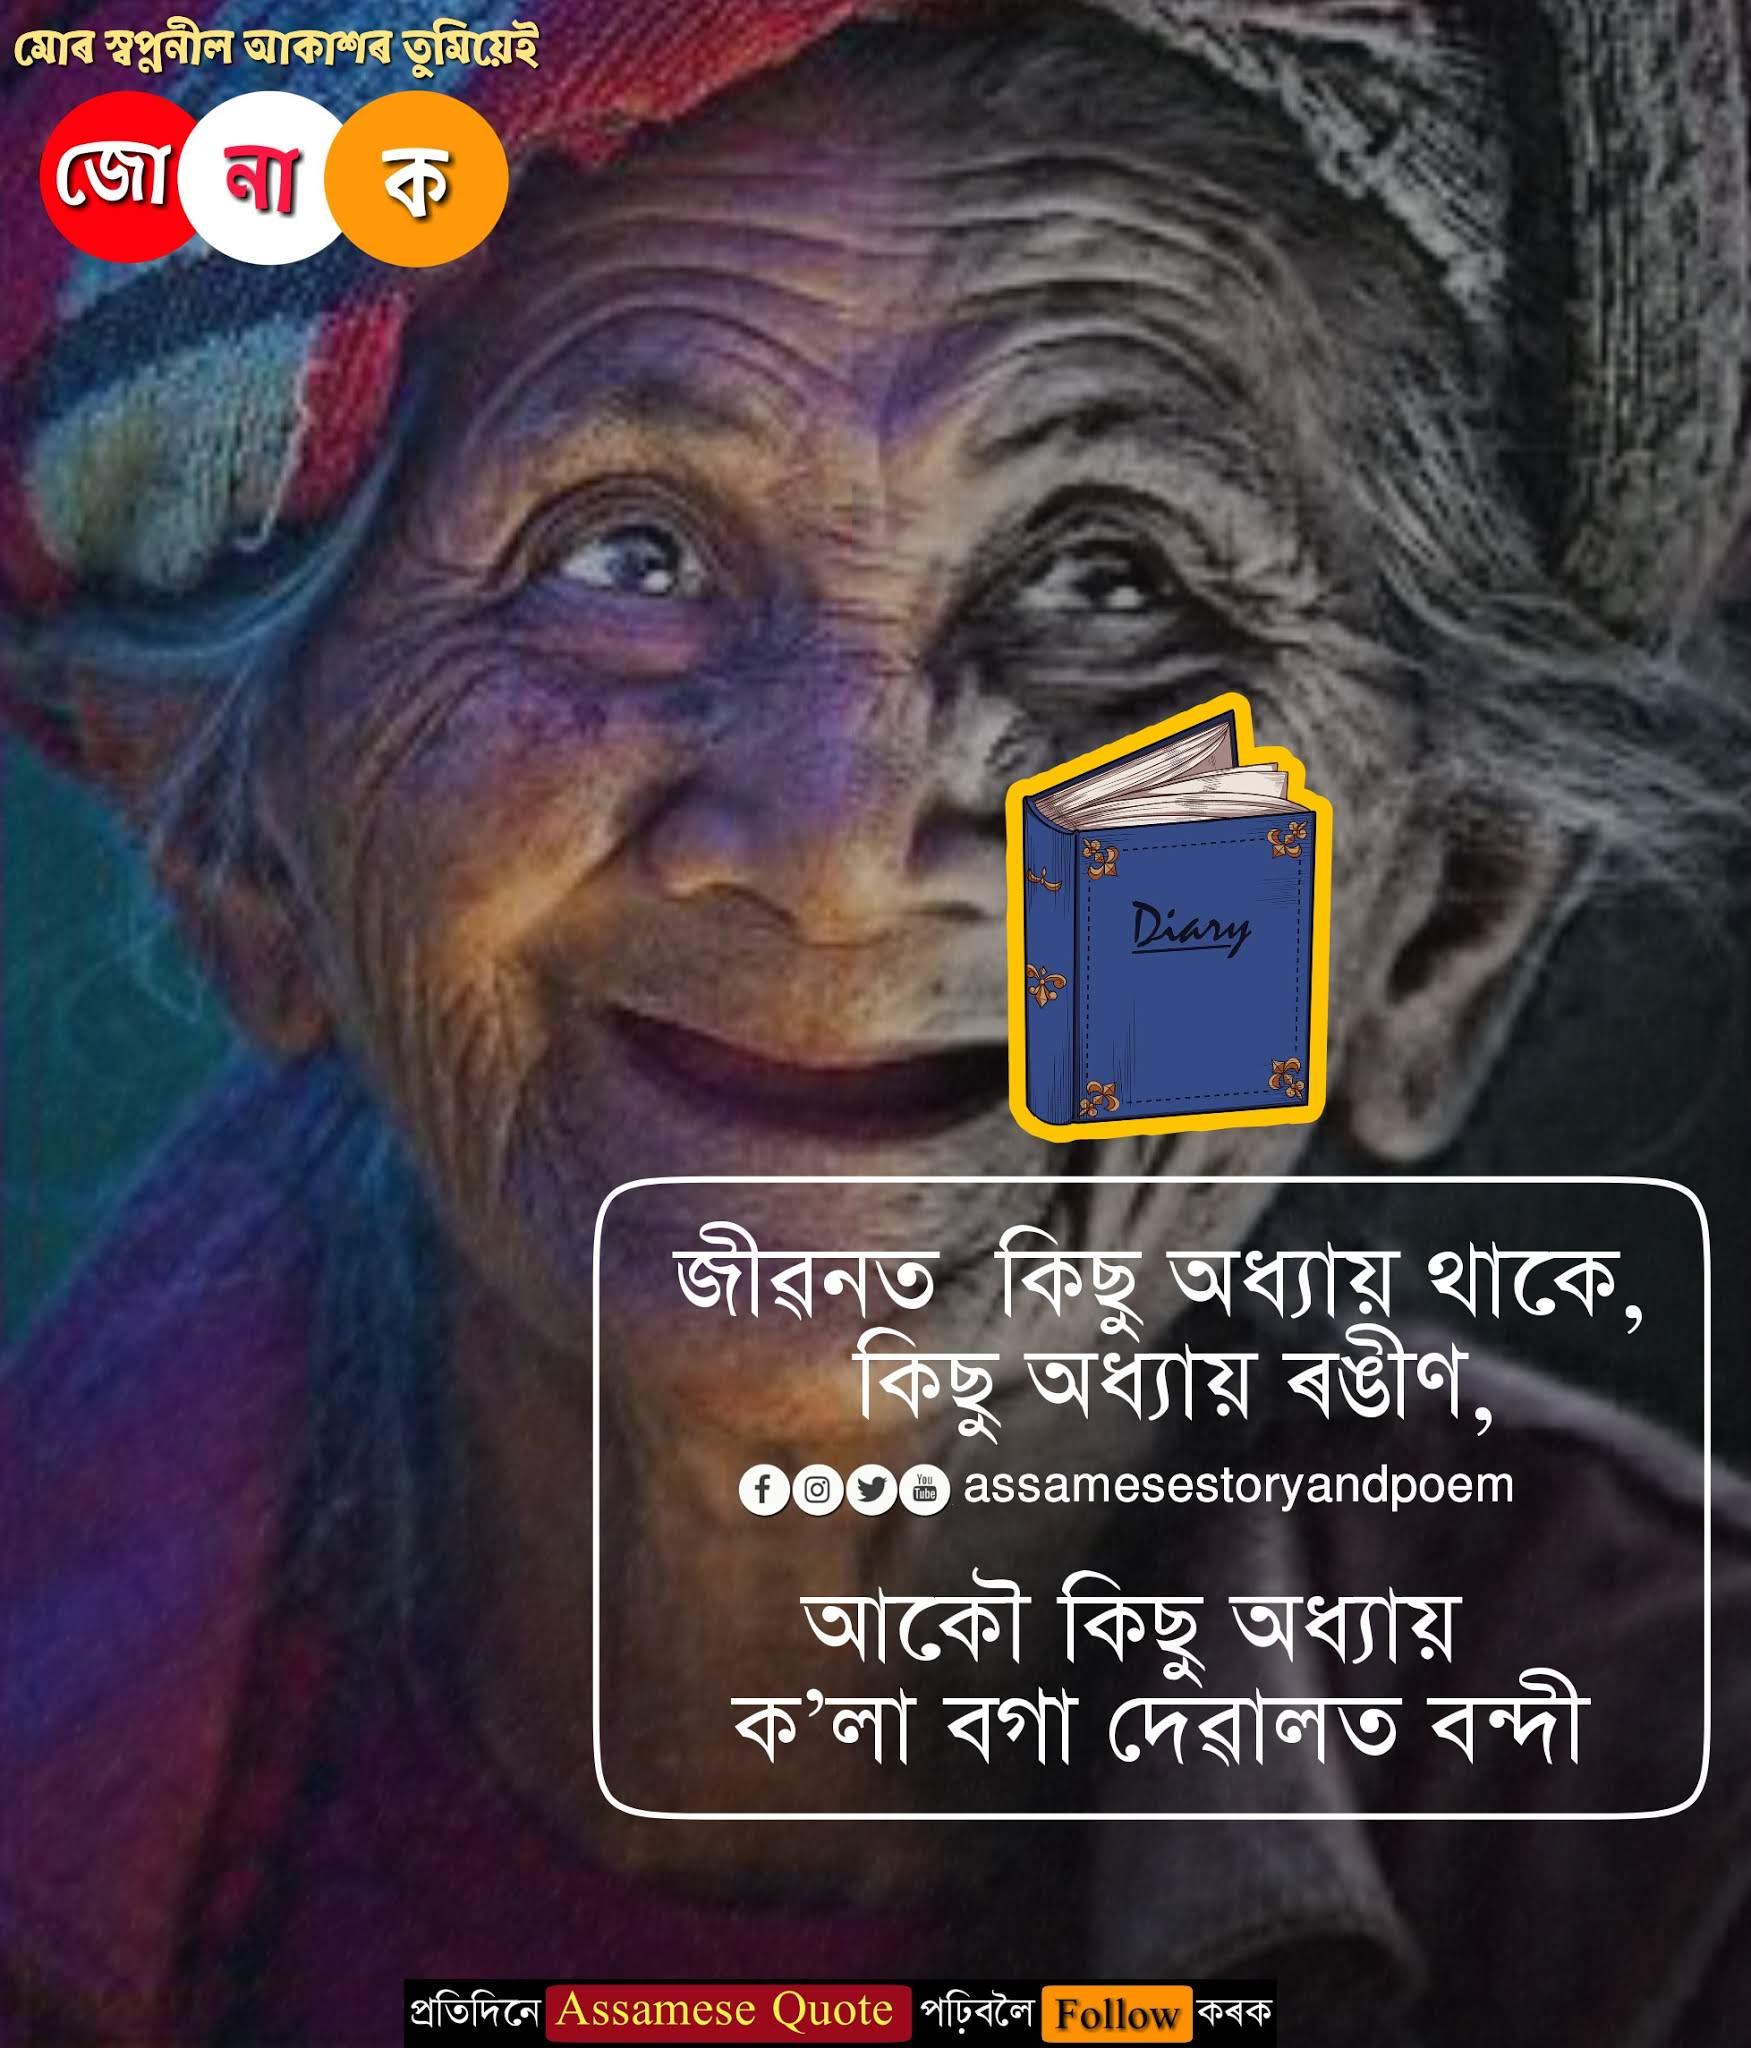 sacha pyar sad status in assamese